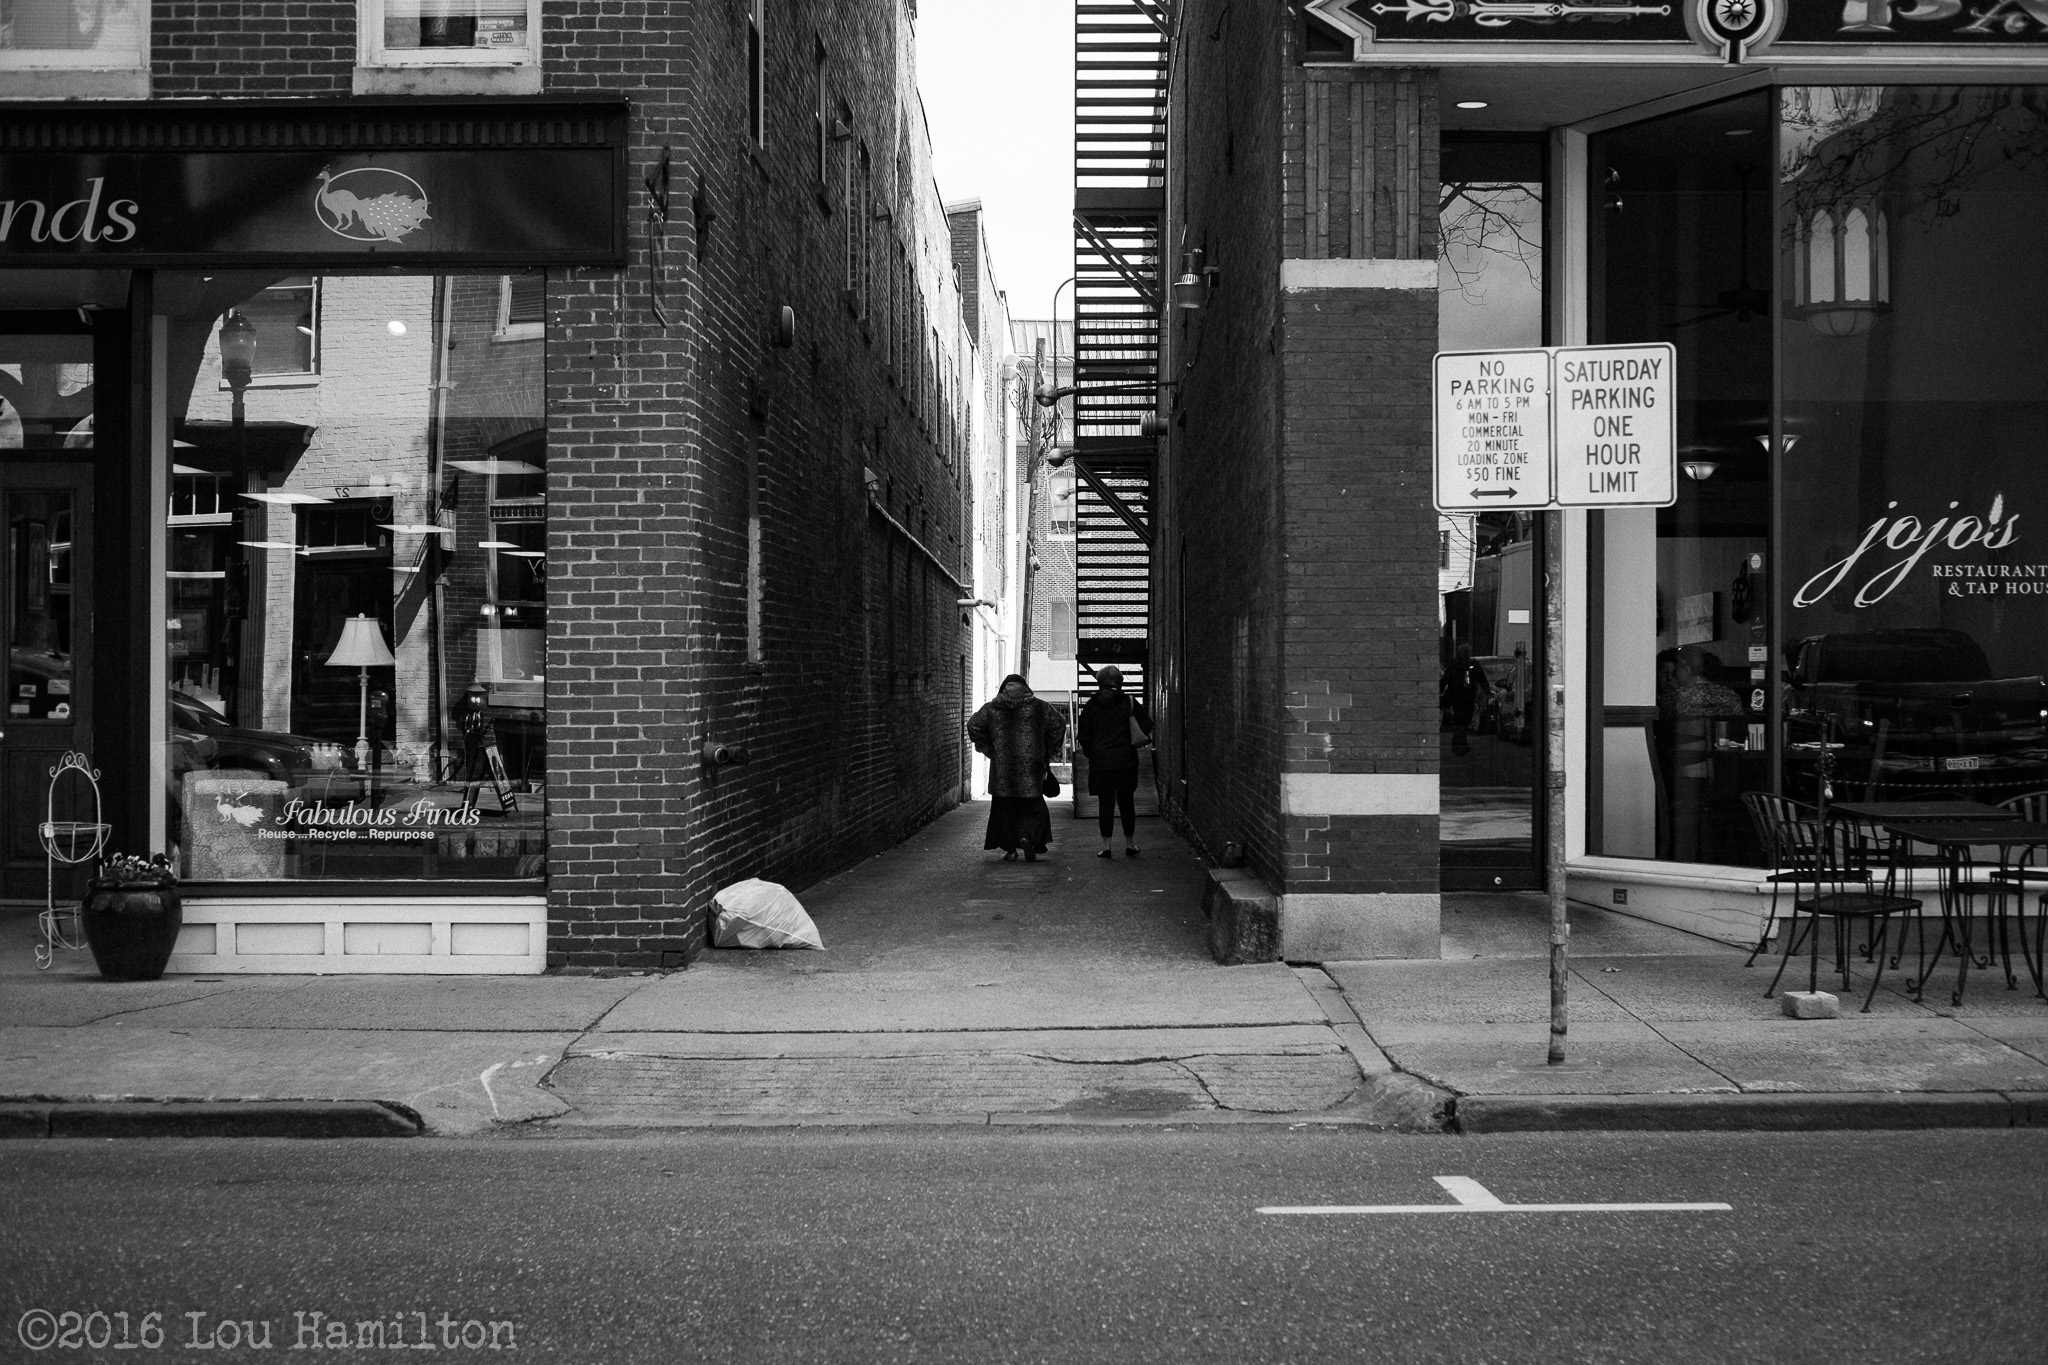 8 April 2016 -- Frederick, MD (Patrick Street)